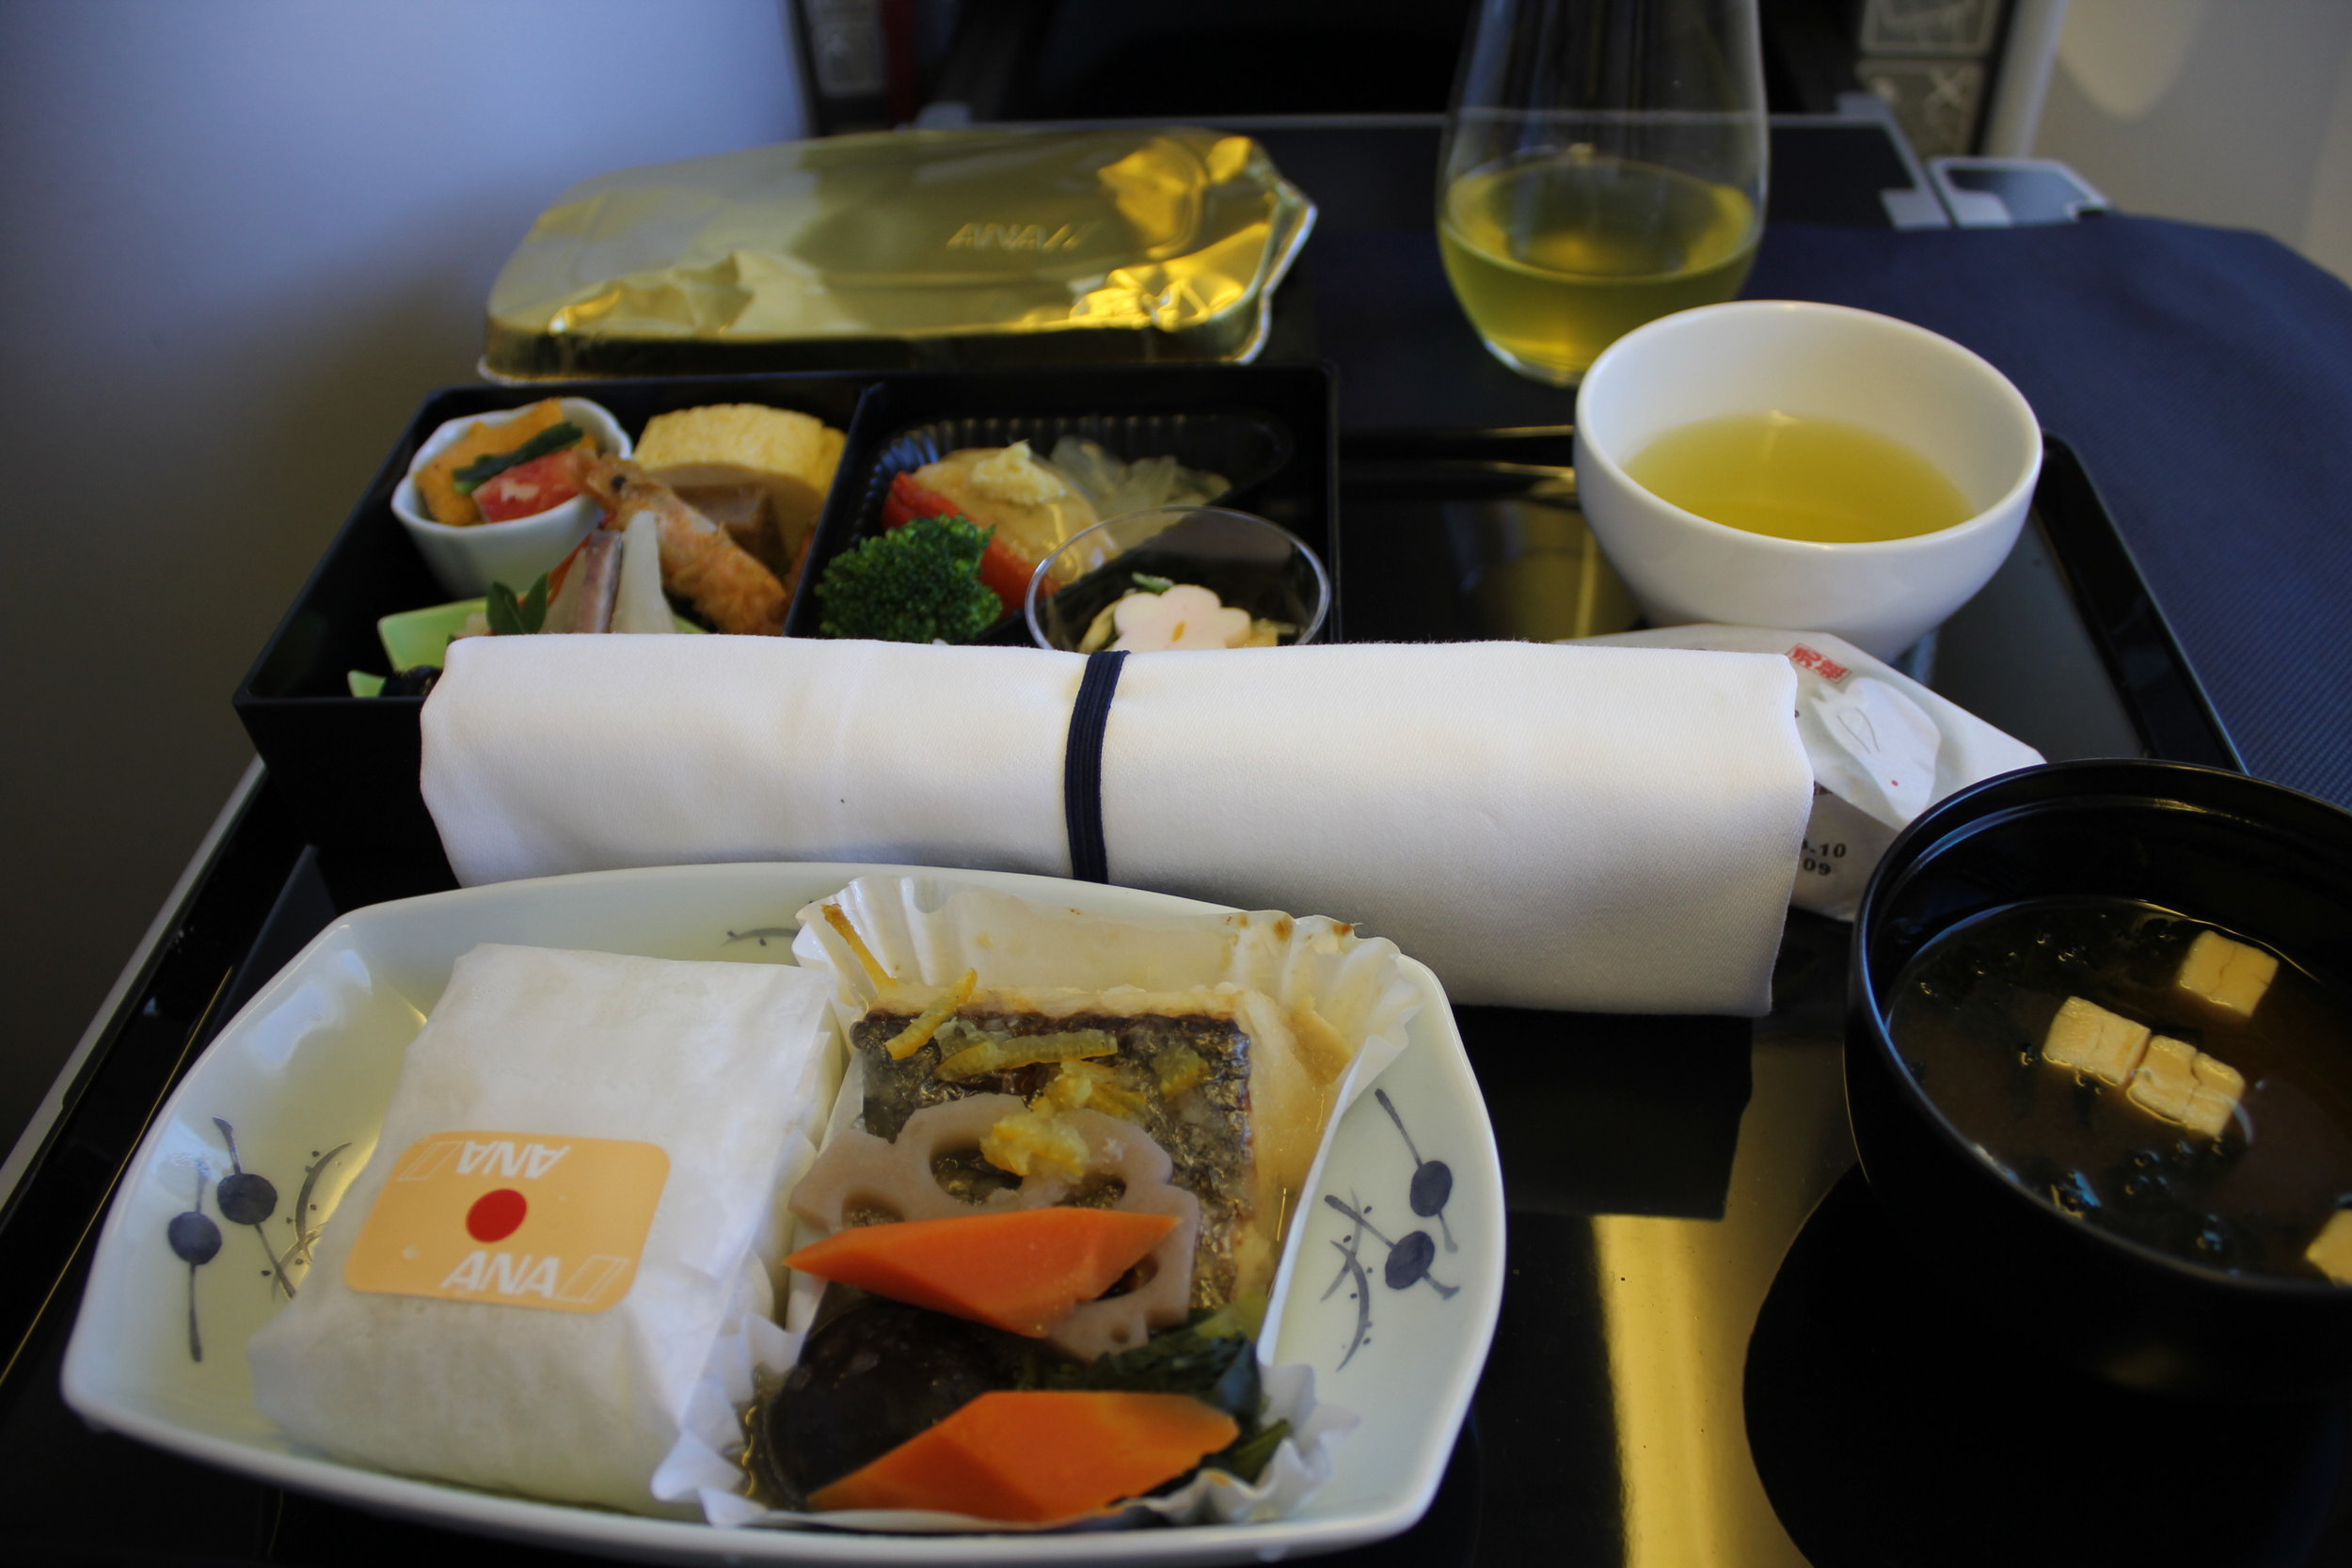 ANA 777 business class – Lunch